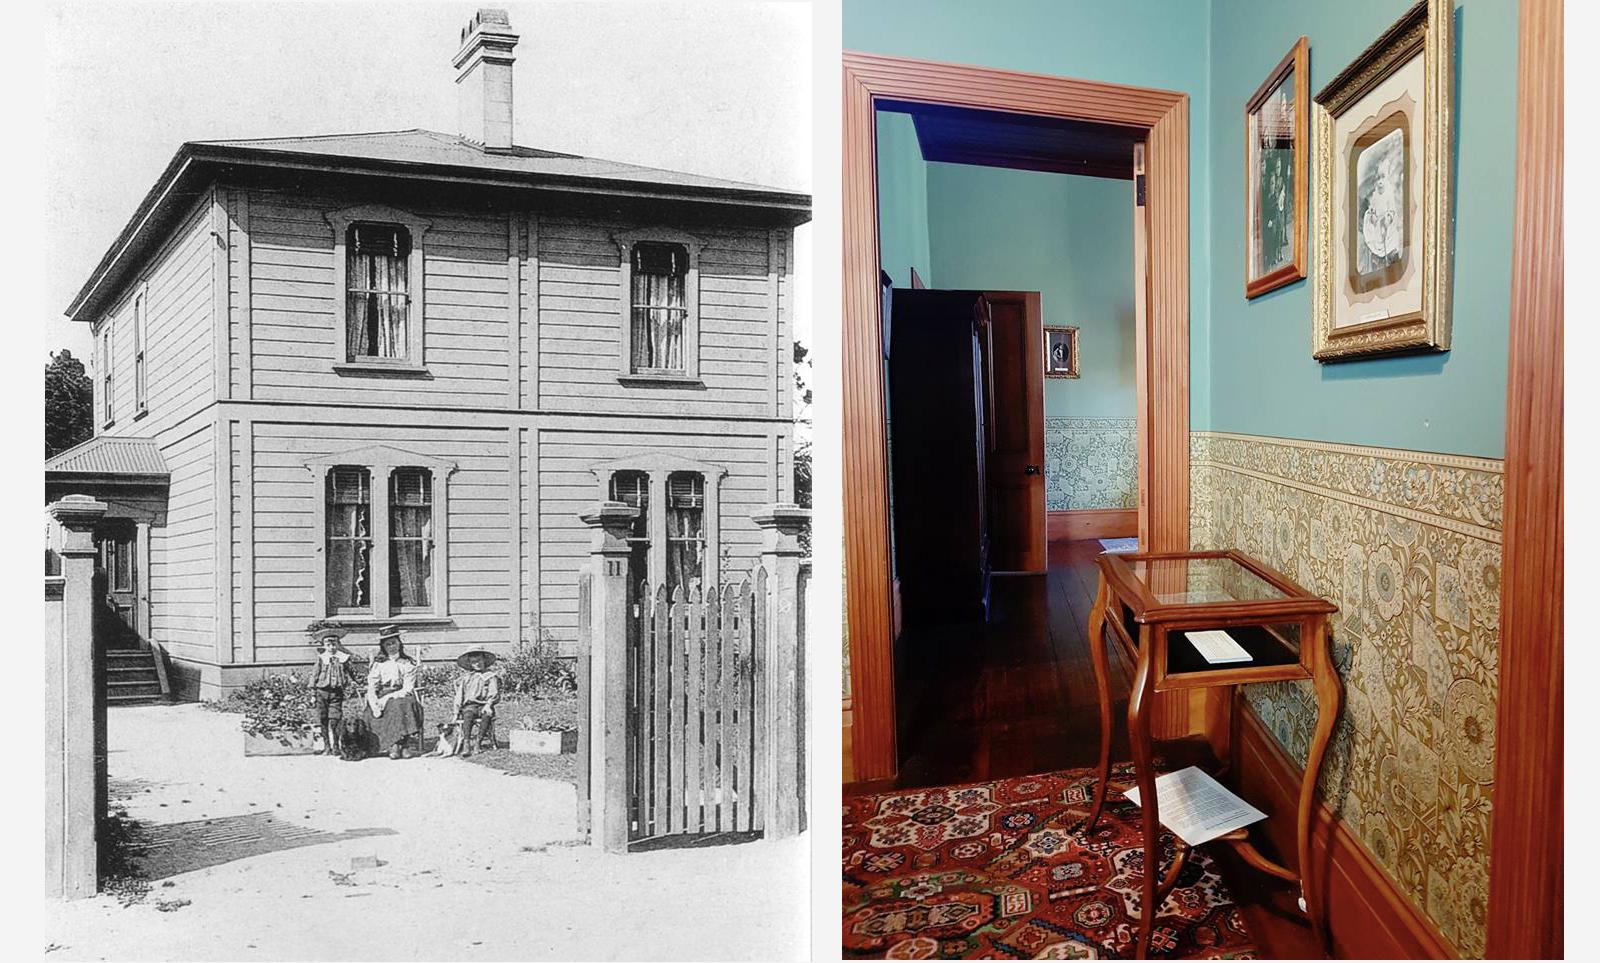 Local de nascimento de Katherine Mansfield, Thorndon, Wellington